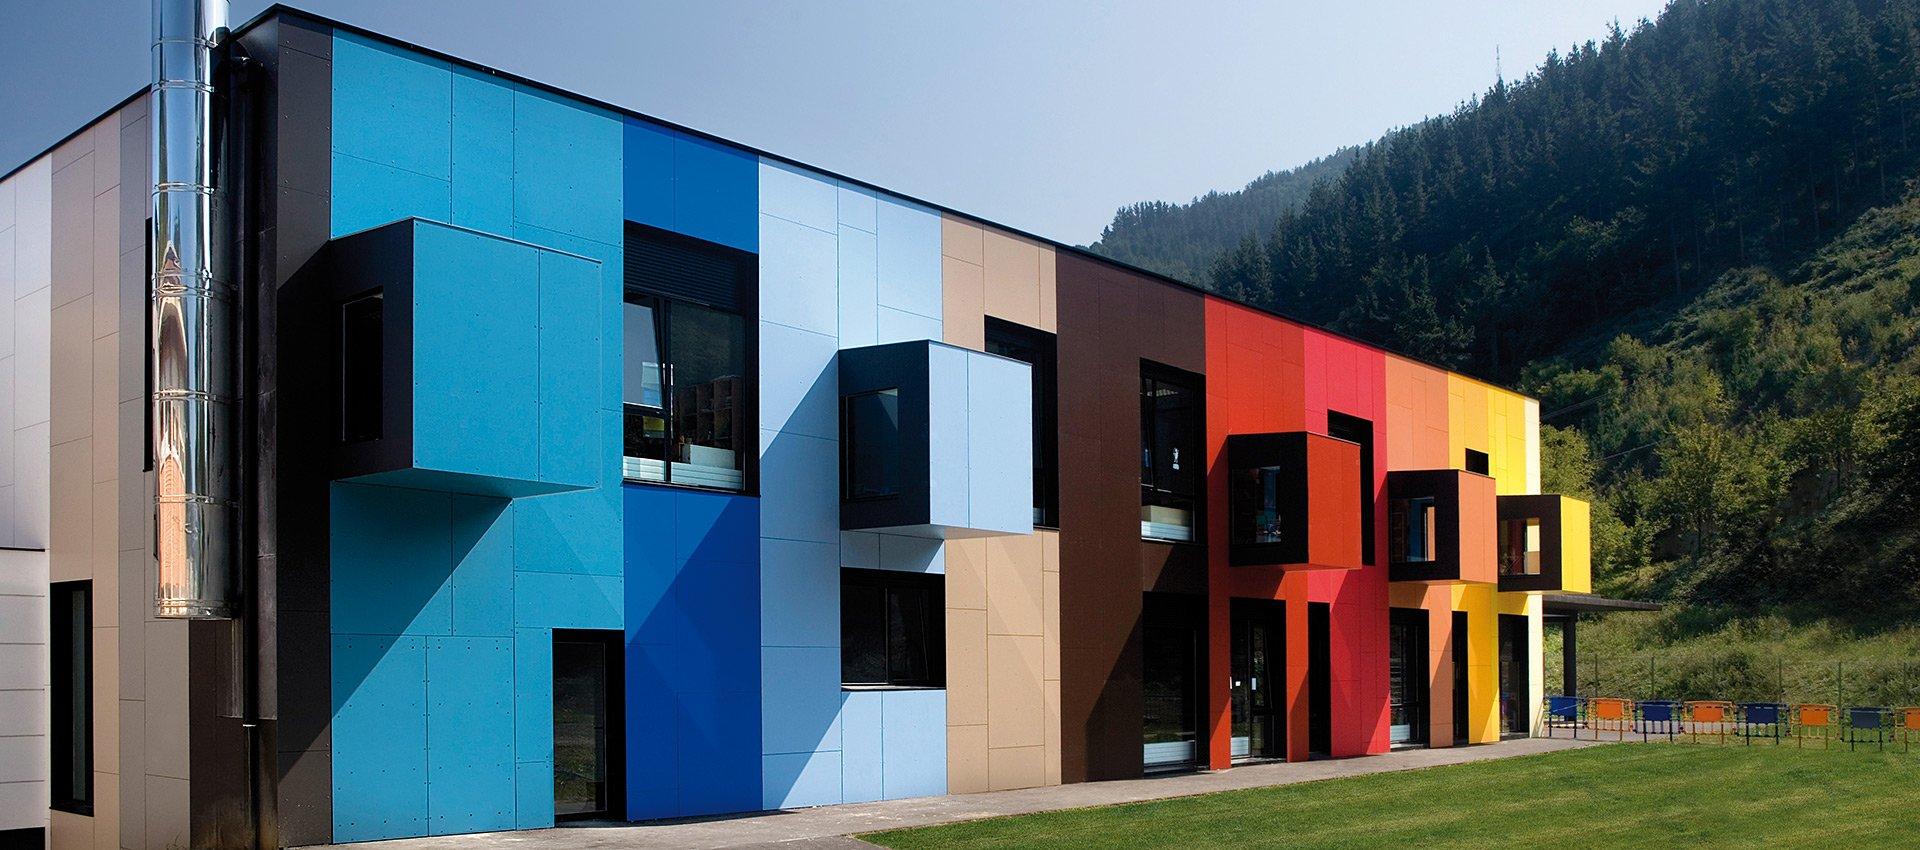 husk architectural rainscreen cladding high pressure laminate (hpl) formica vivix phenolic, engineered exterior facade panels